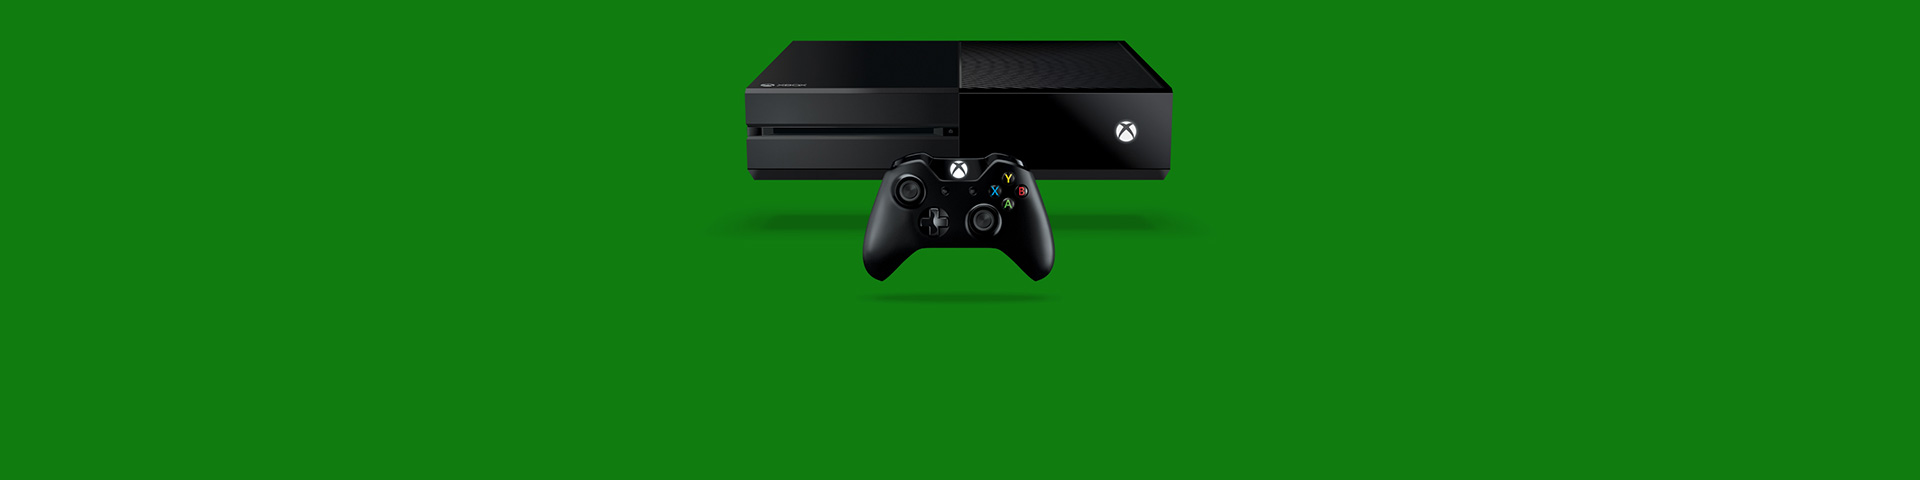 Xbox One 콘솔 및 컨트롤러